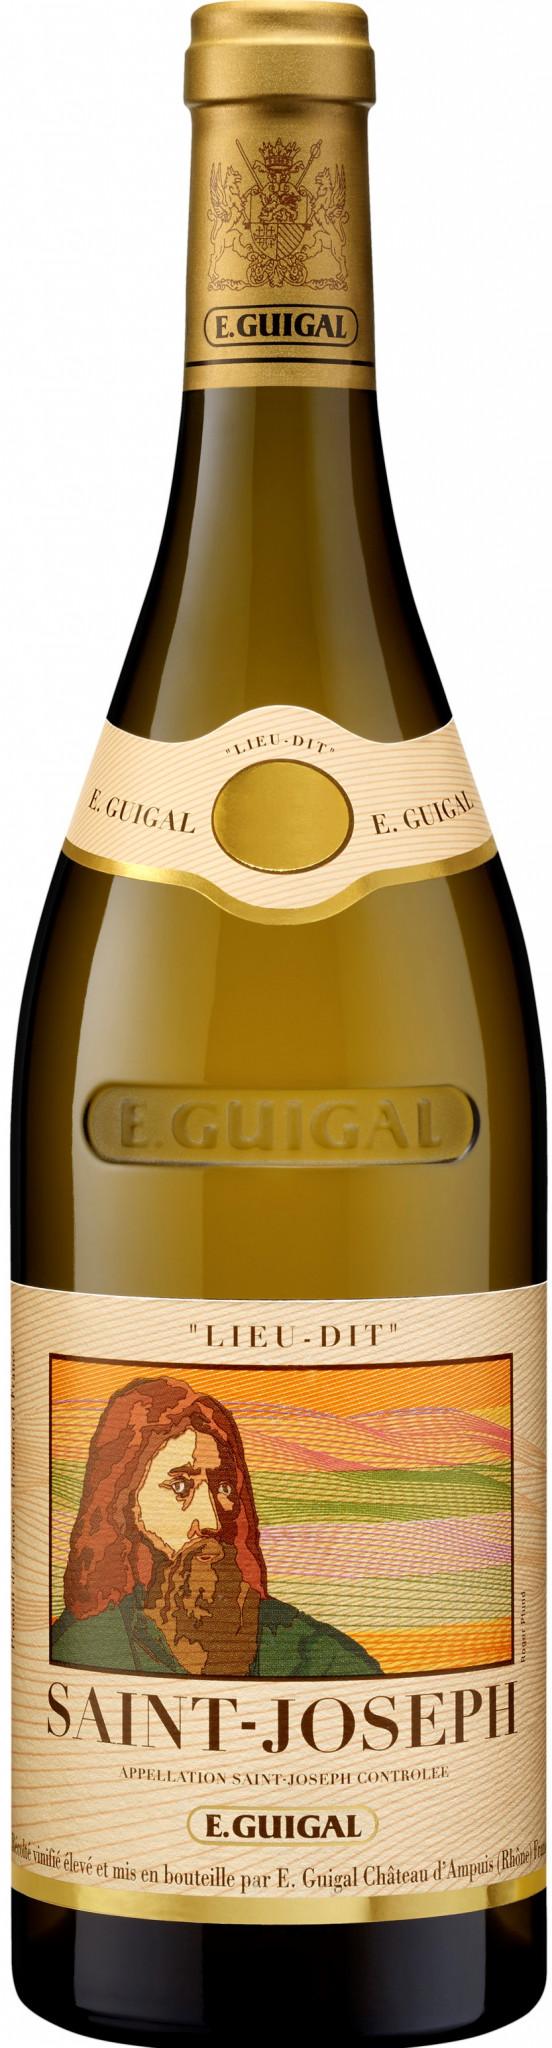 Guigal Saint-Joseph-Lieu-Dit-Blanc Wineaffair